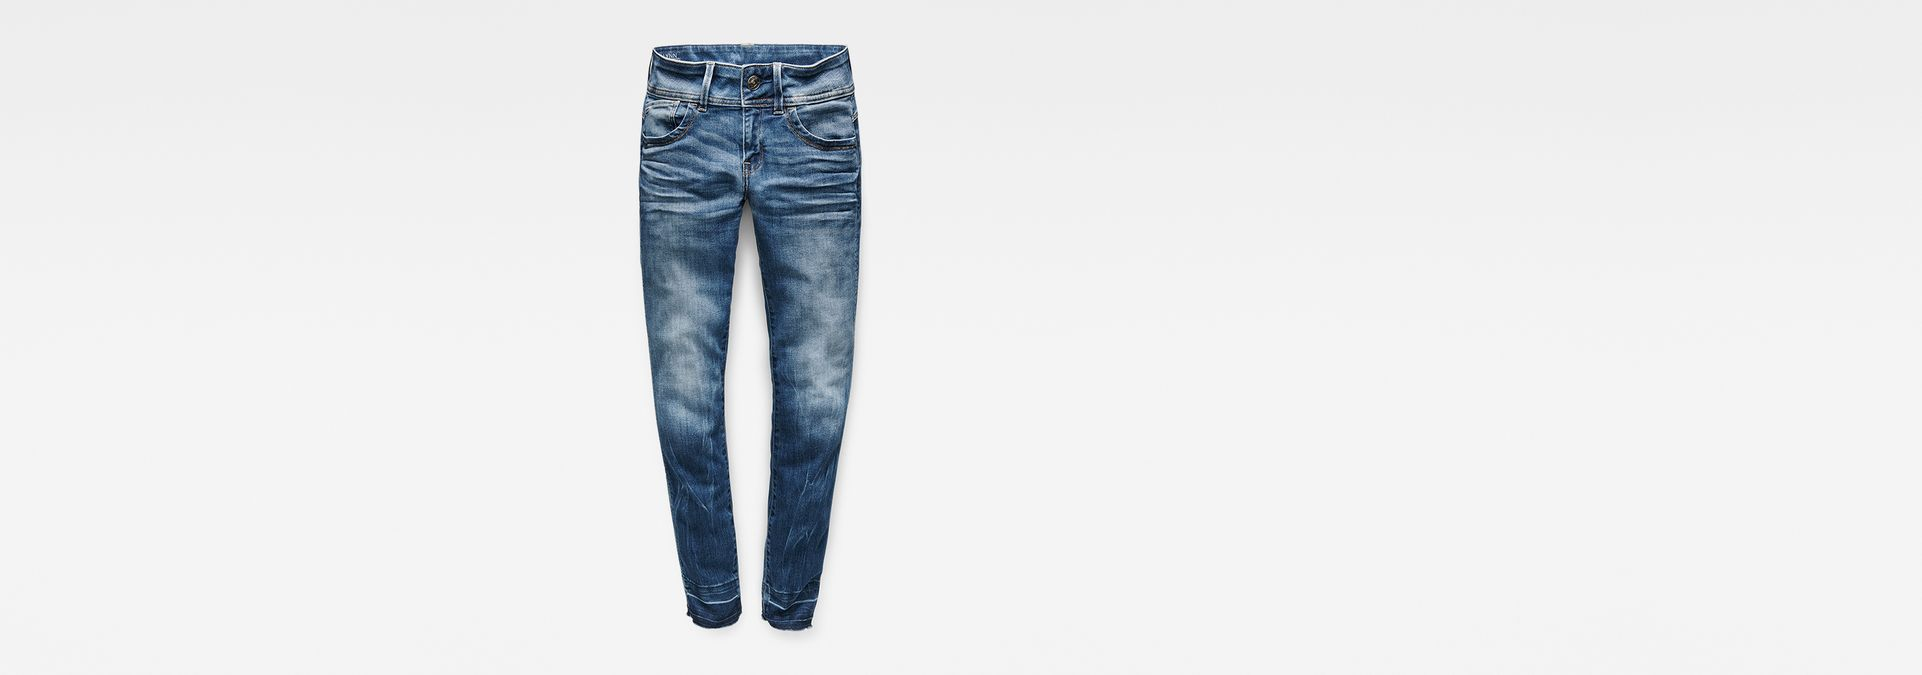 74c2b9f30c6 Lynn Mid Waist Skinny RP Ankle Jeans | G-Star RAW®